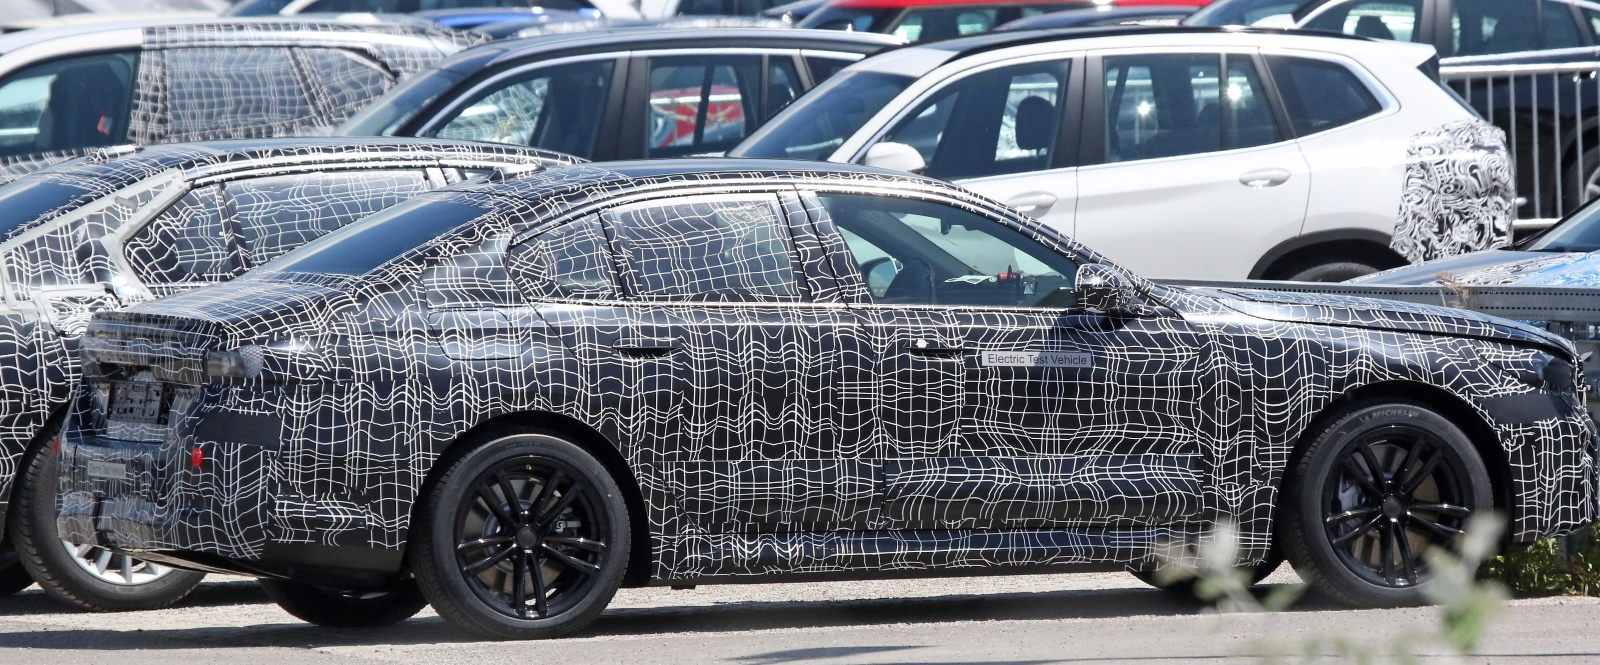 BMW serii 5 - bok, profil